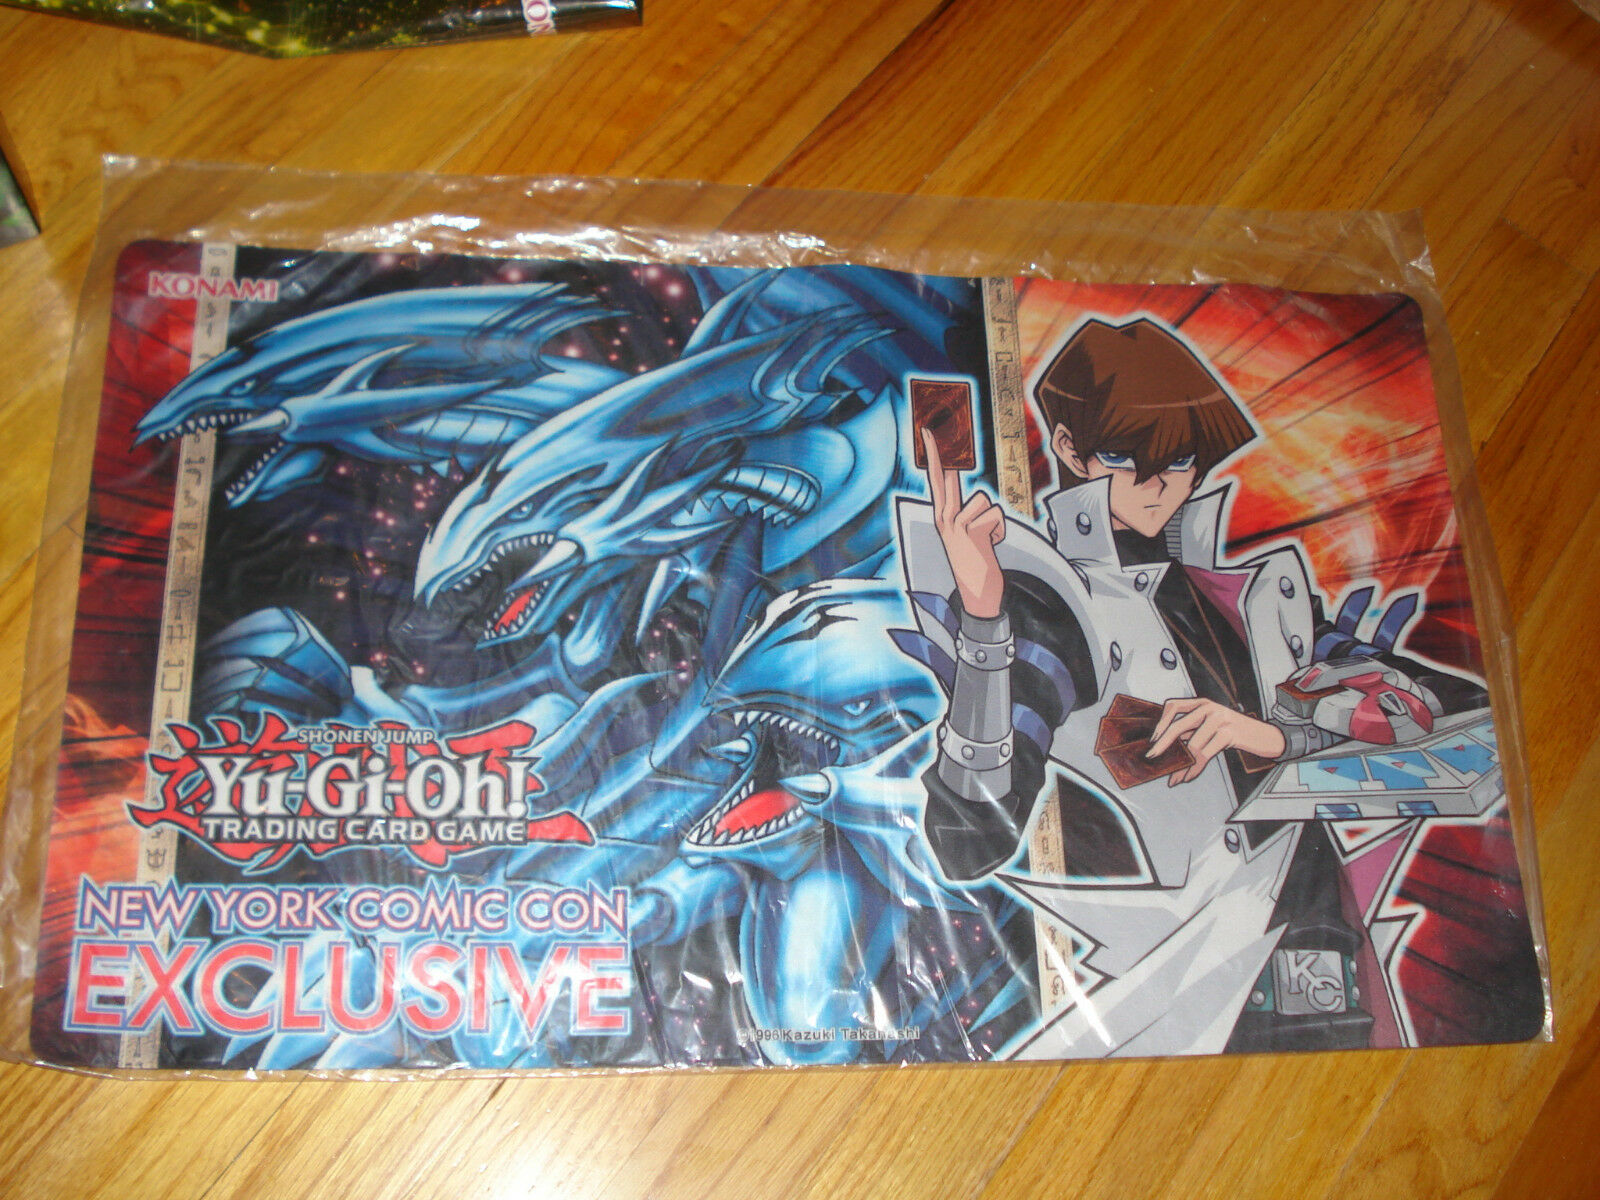 Yu-Gi-Oh bluee Eyes Ultimate Dragon Kaiba NYCC NYCC NYCC 2015 comic con exclusive playmat fe01c7